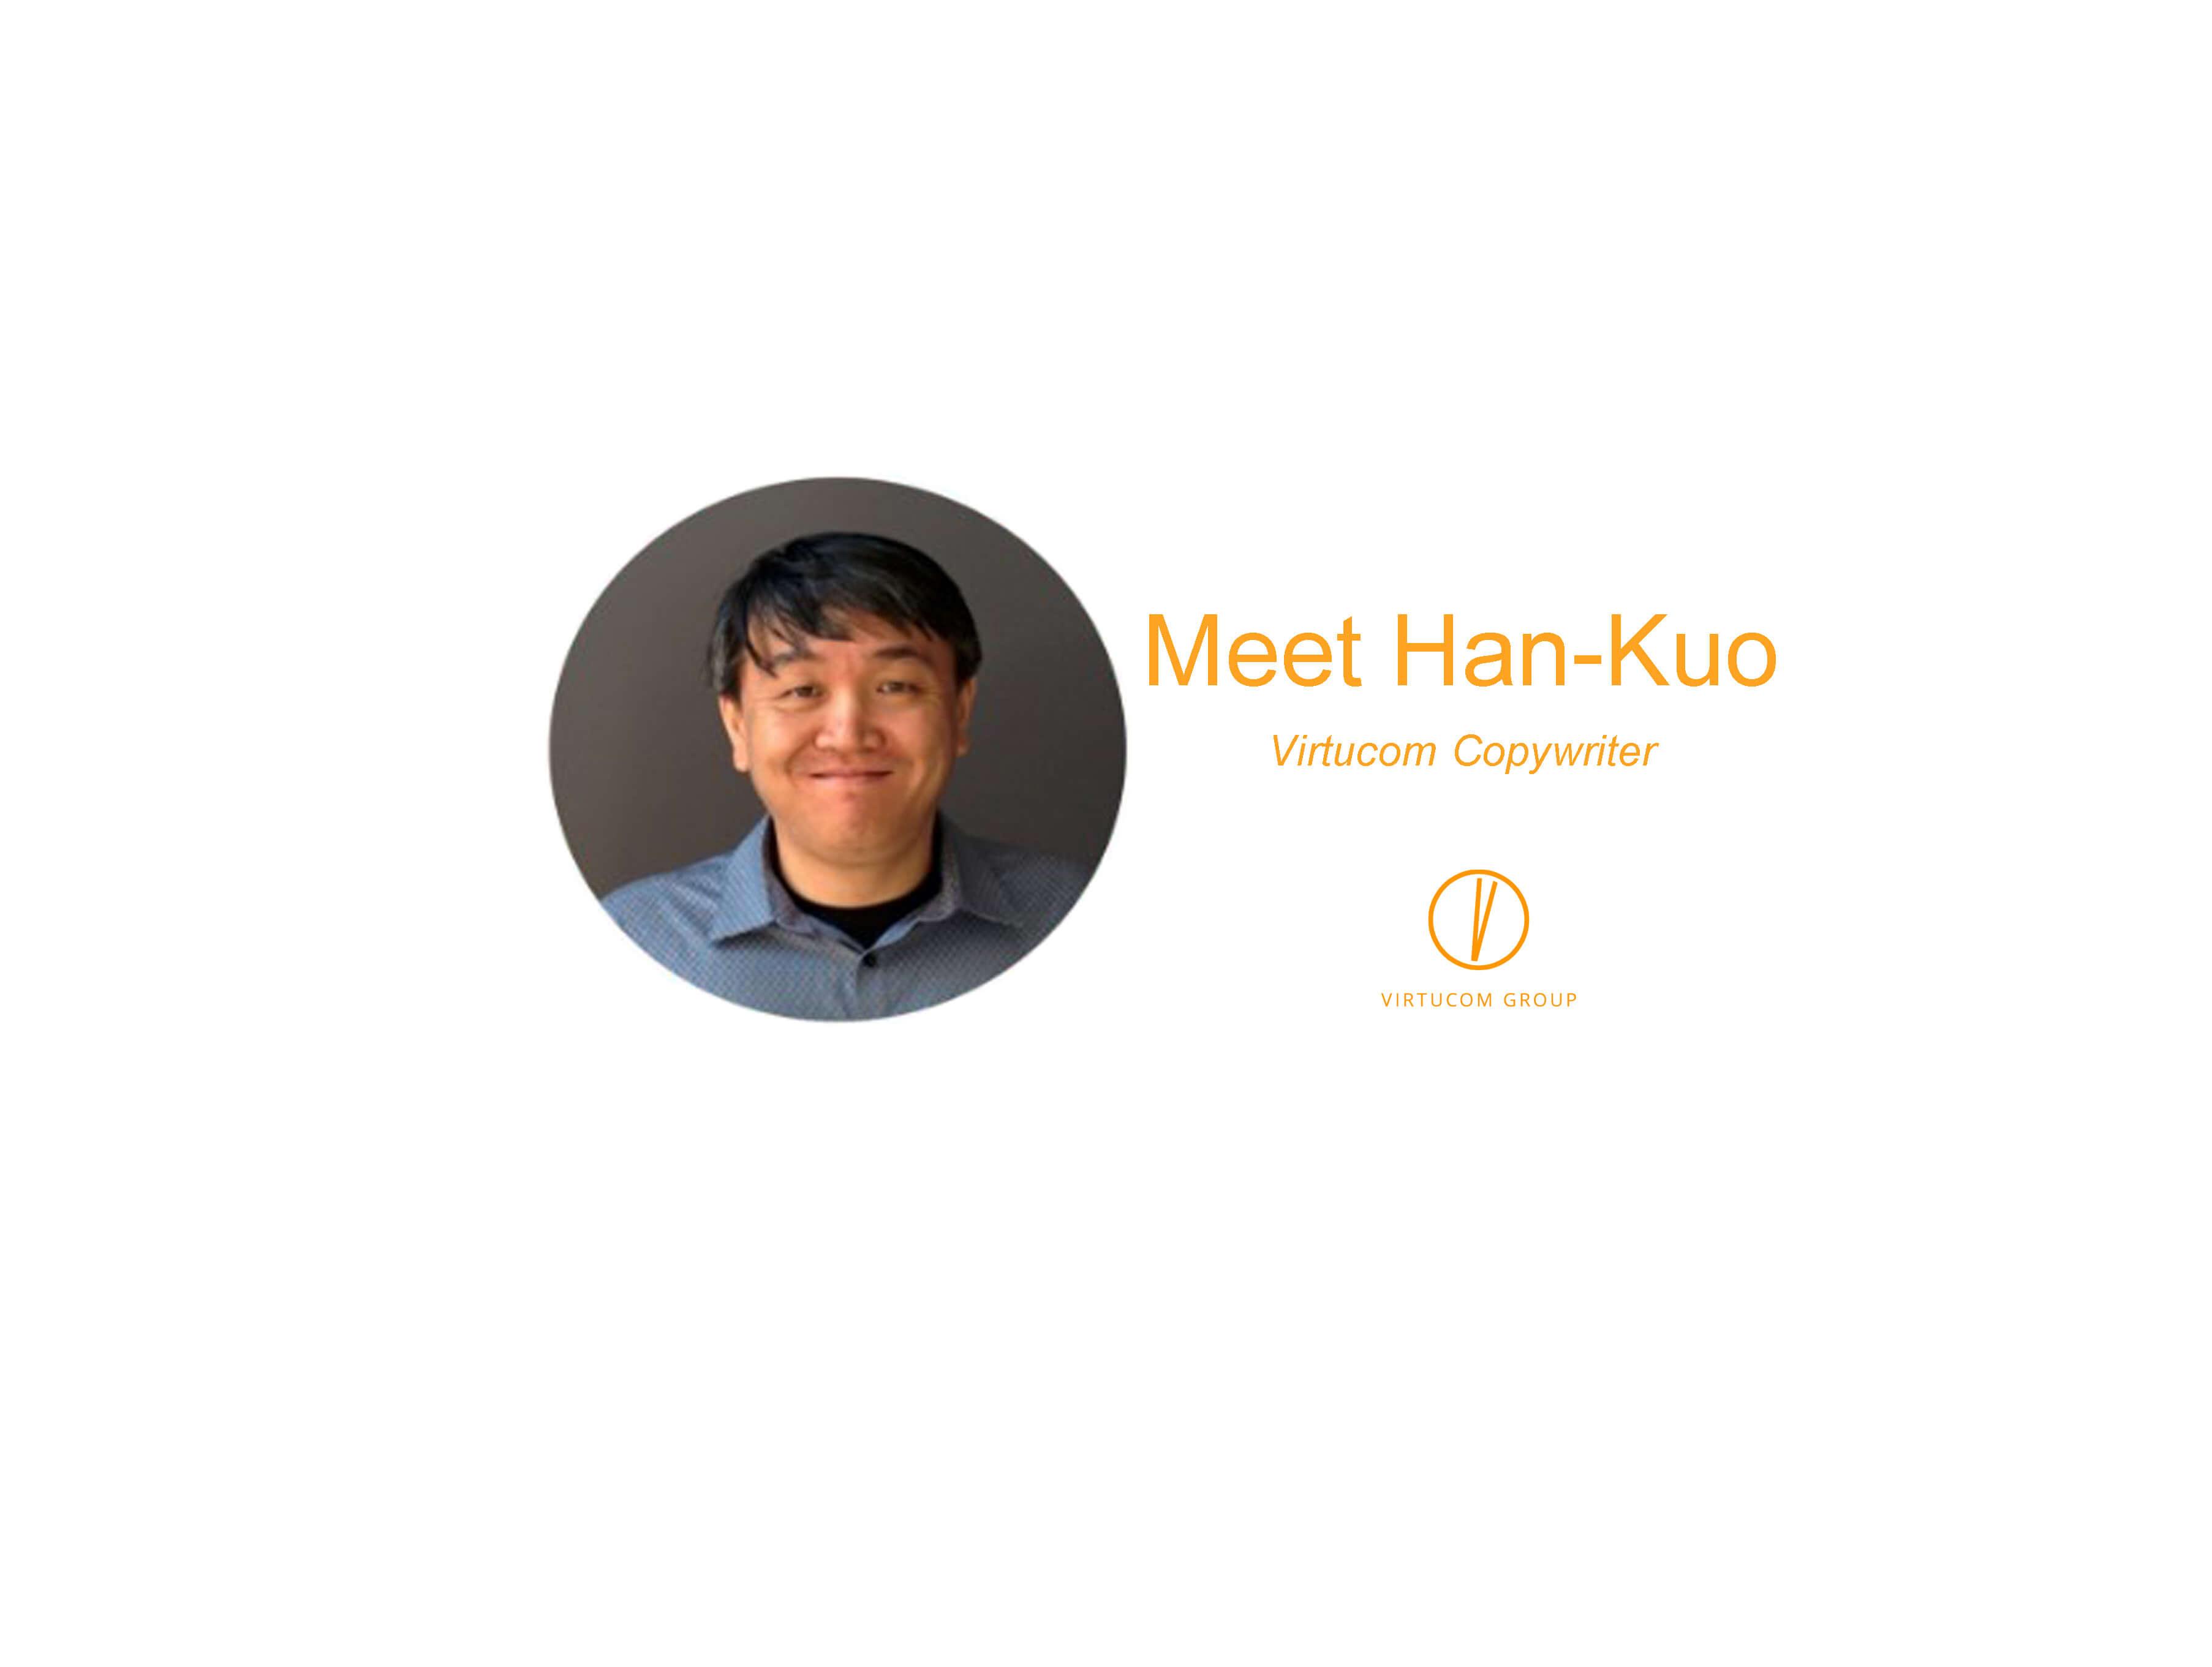 meet-han-kuo.jpg